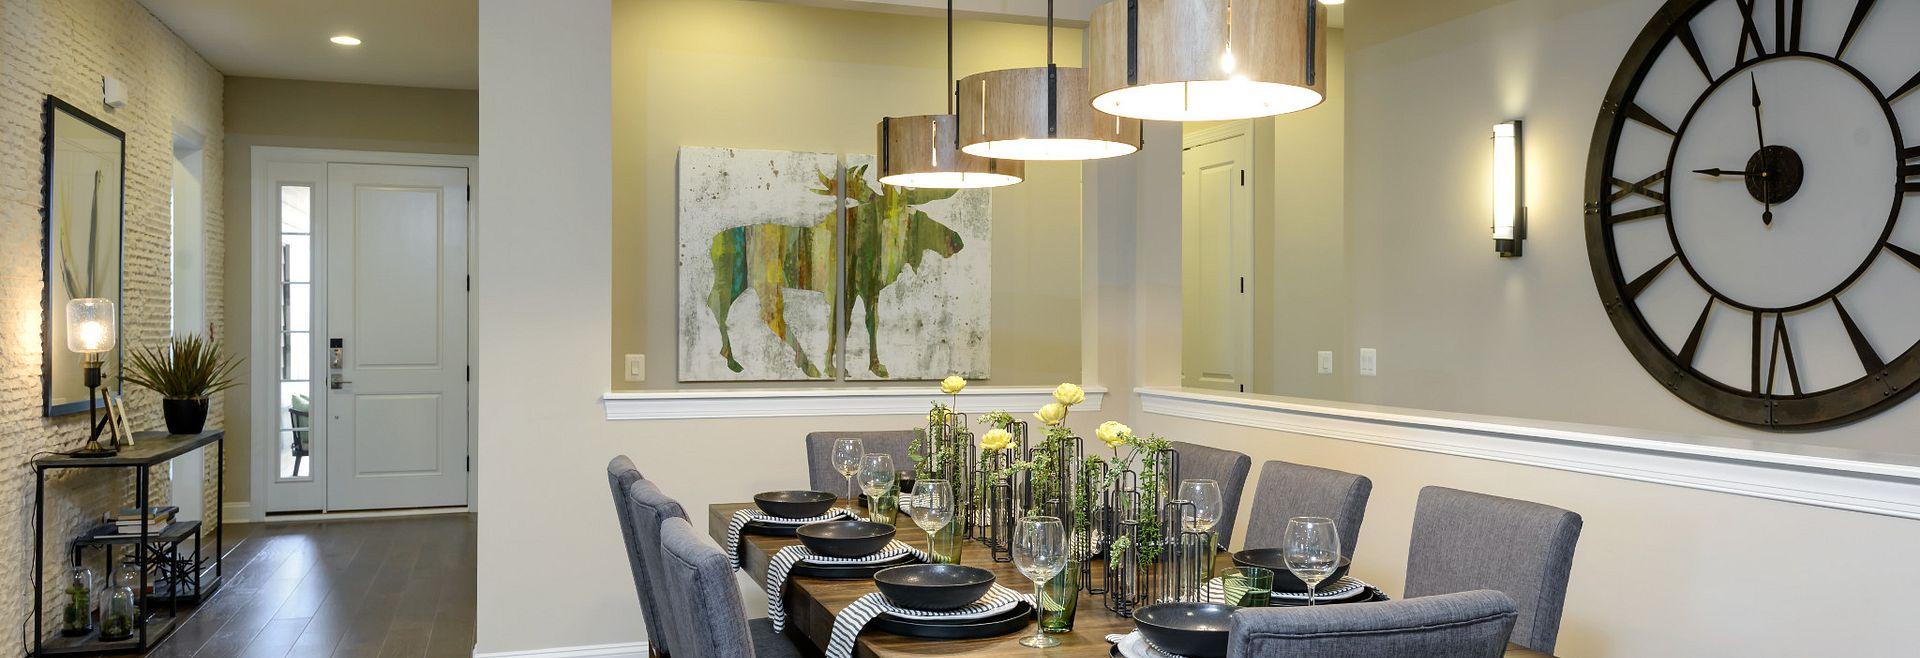 Evoke Plan Dining Room